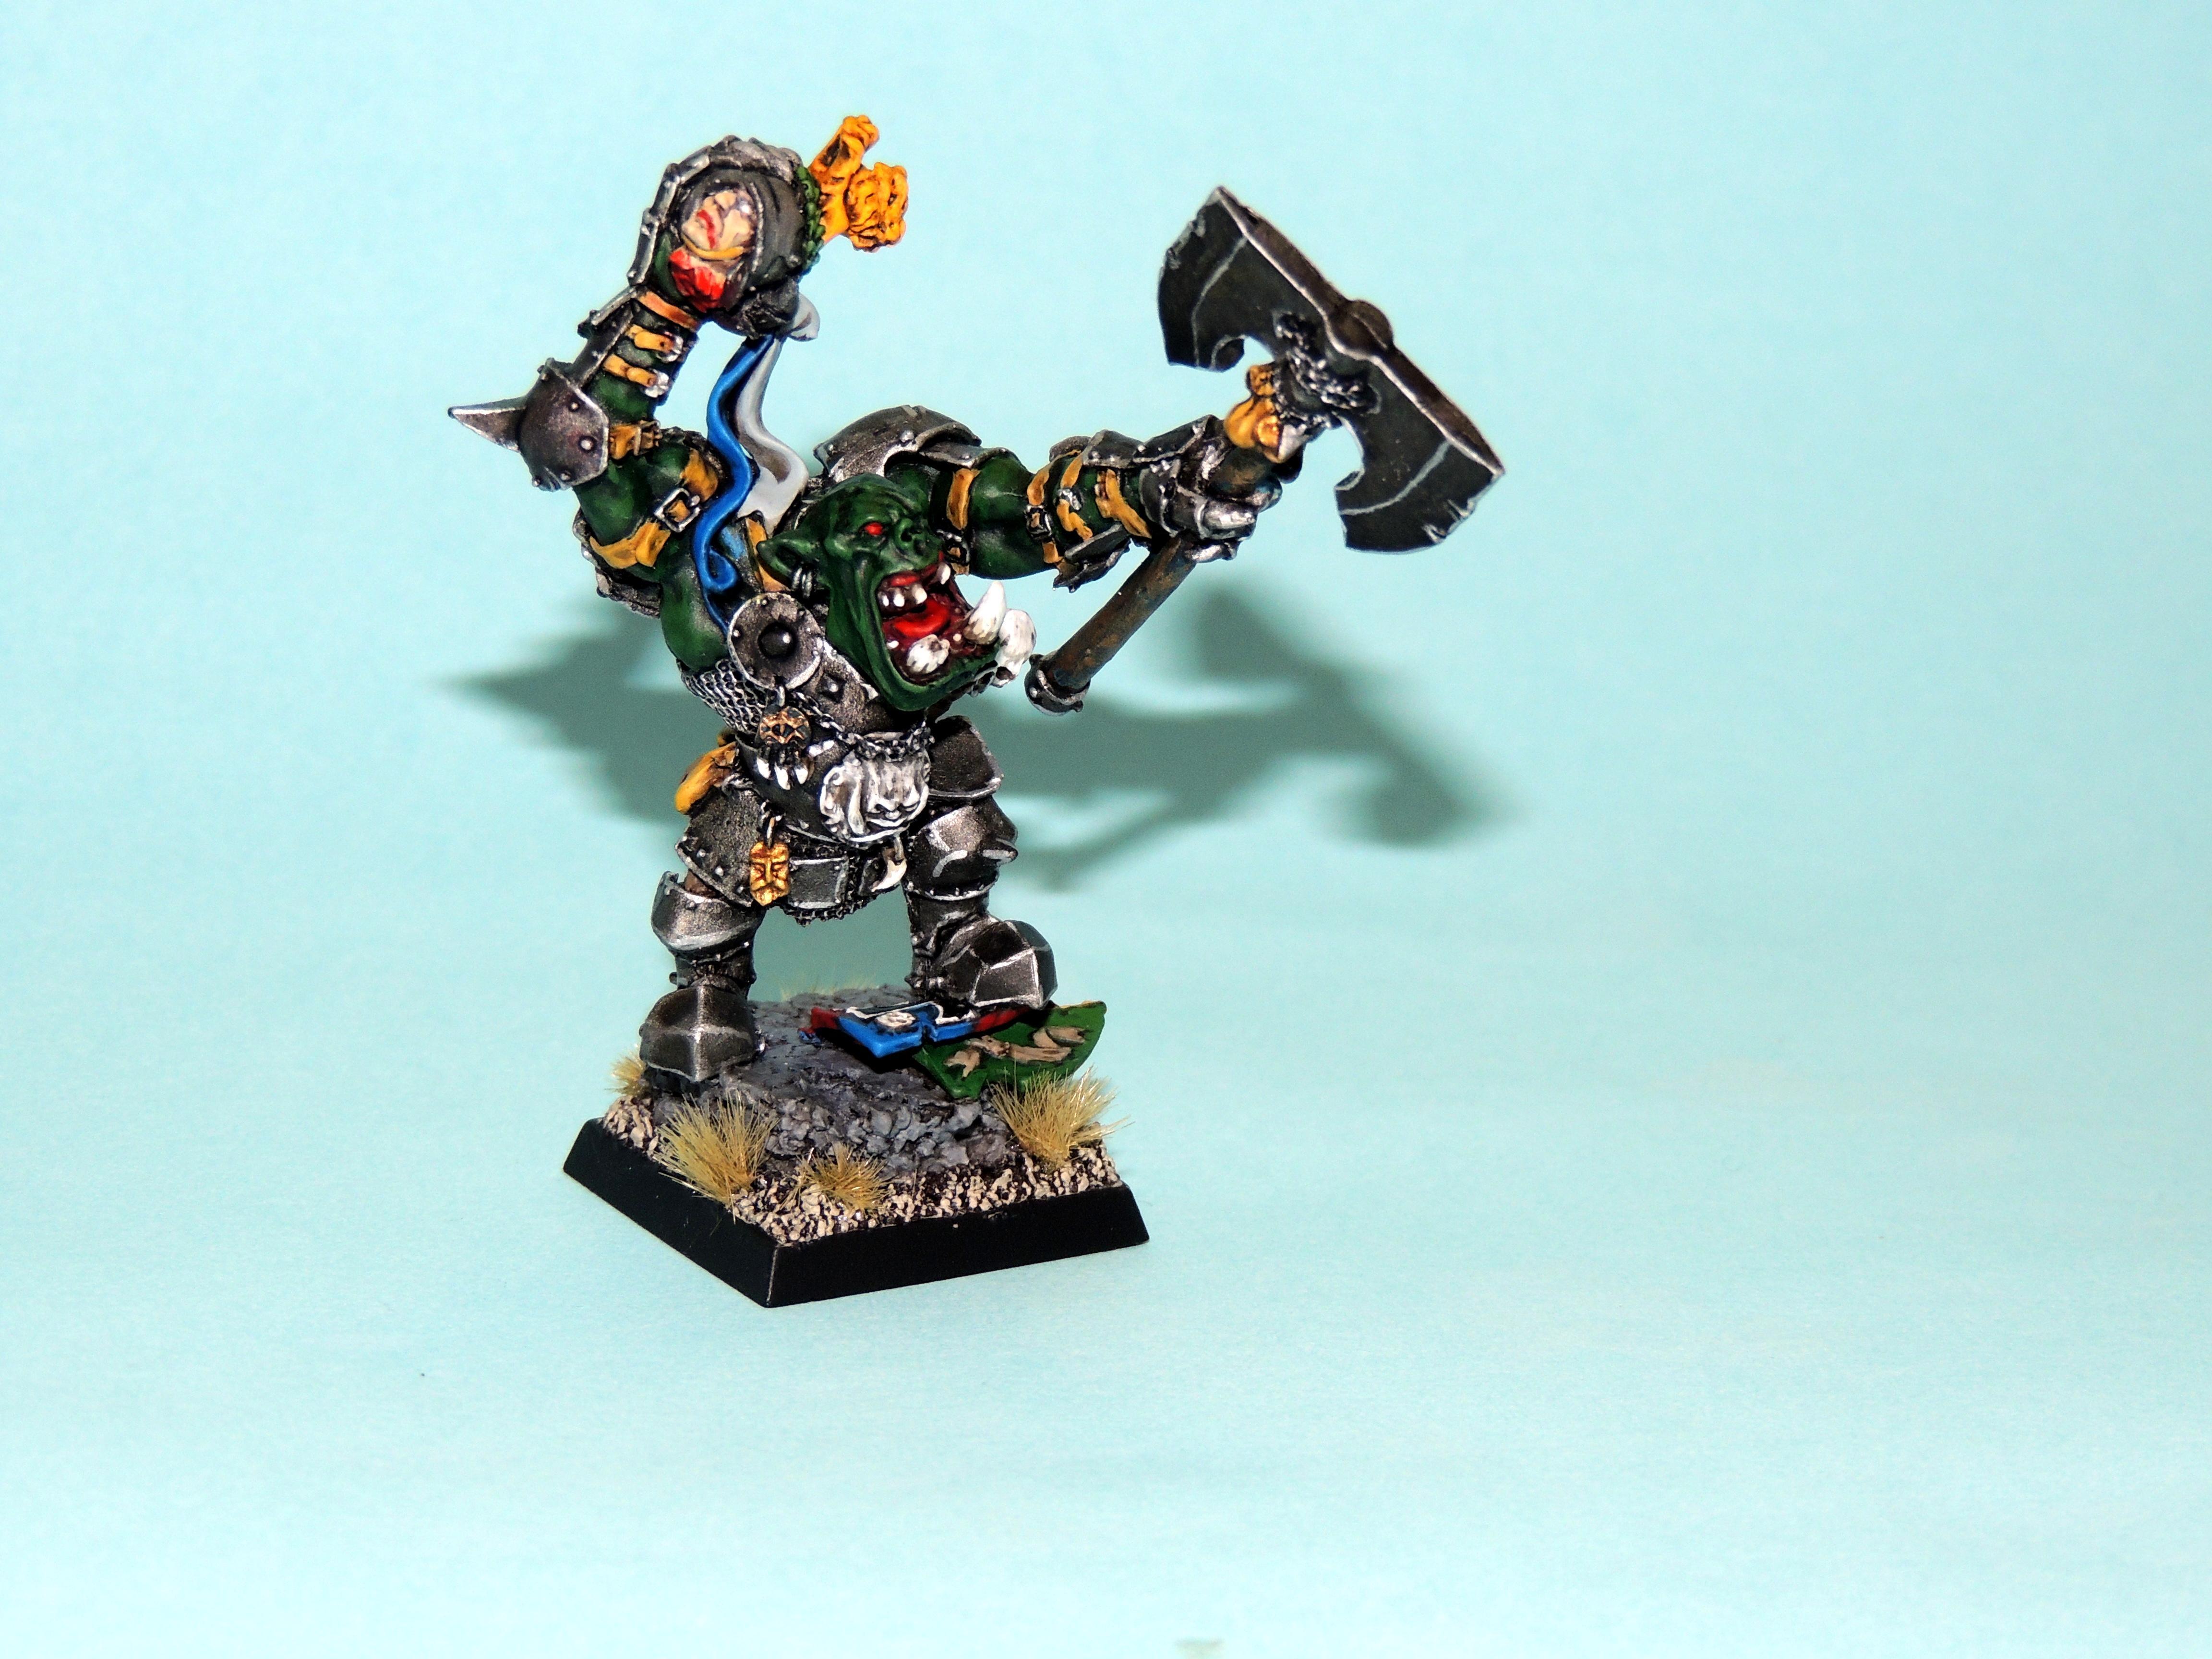 Black Orc, Orcs, Grimgor Ironhide